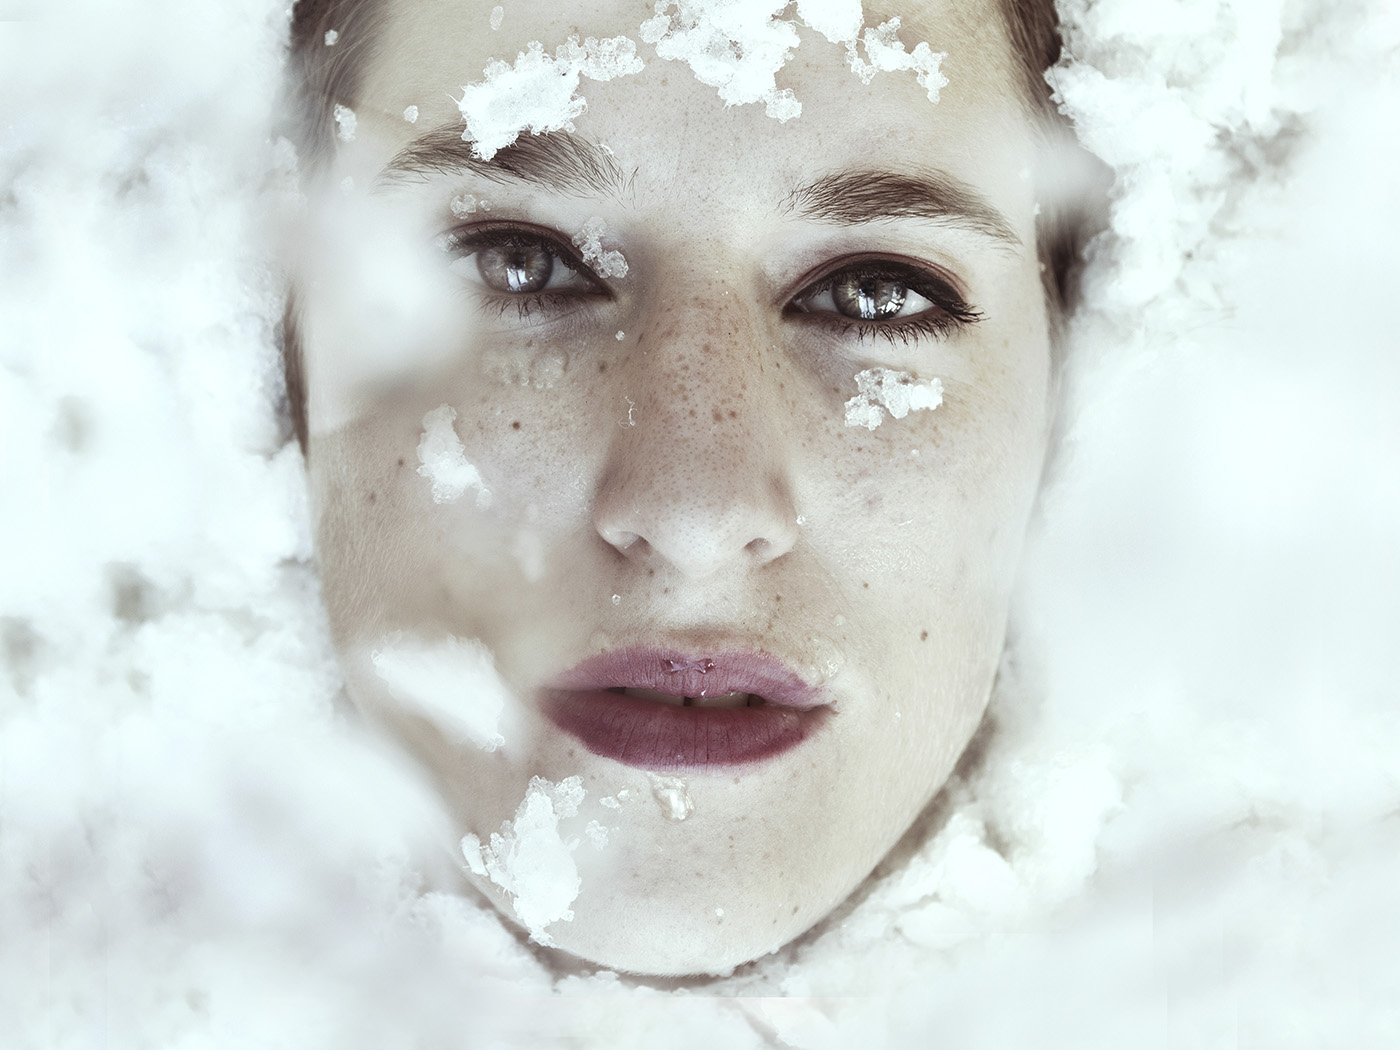 Invierno eterno (Noelia Herrera Navarro)